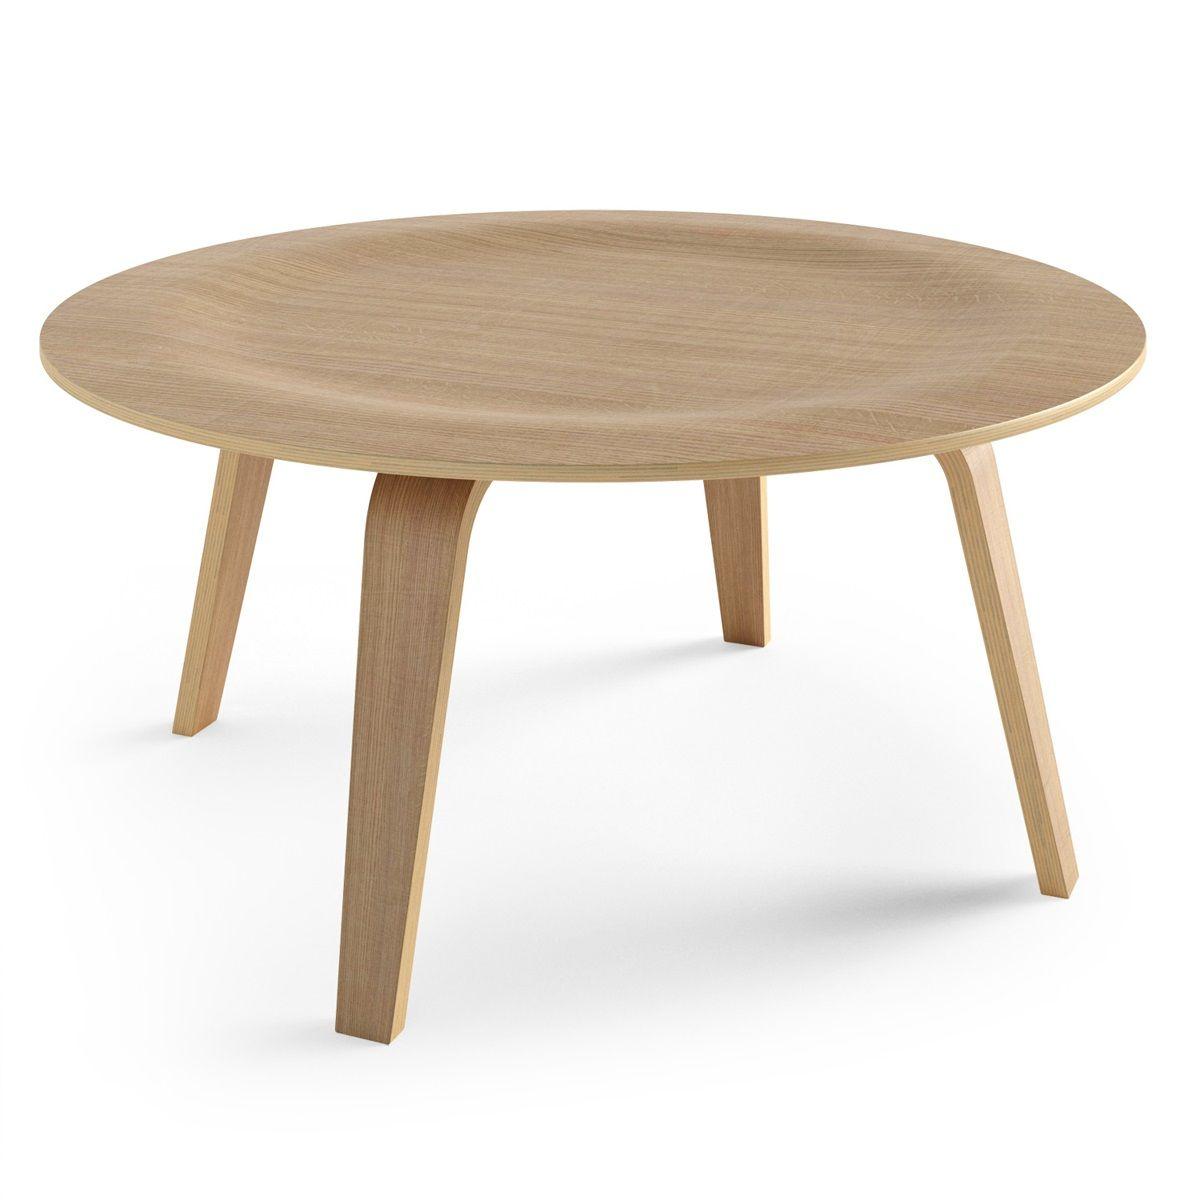 Plywood Coffee Table Plywood Coffee Table Coffee Table Contemporary Coffee Table [ 1200 x 1200 Pixel ]